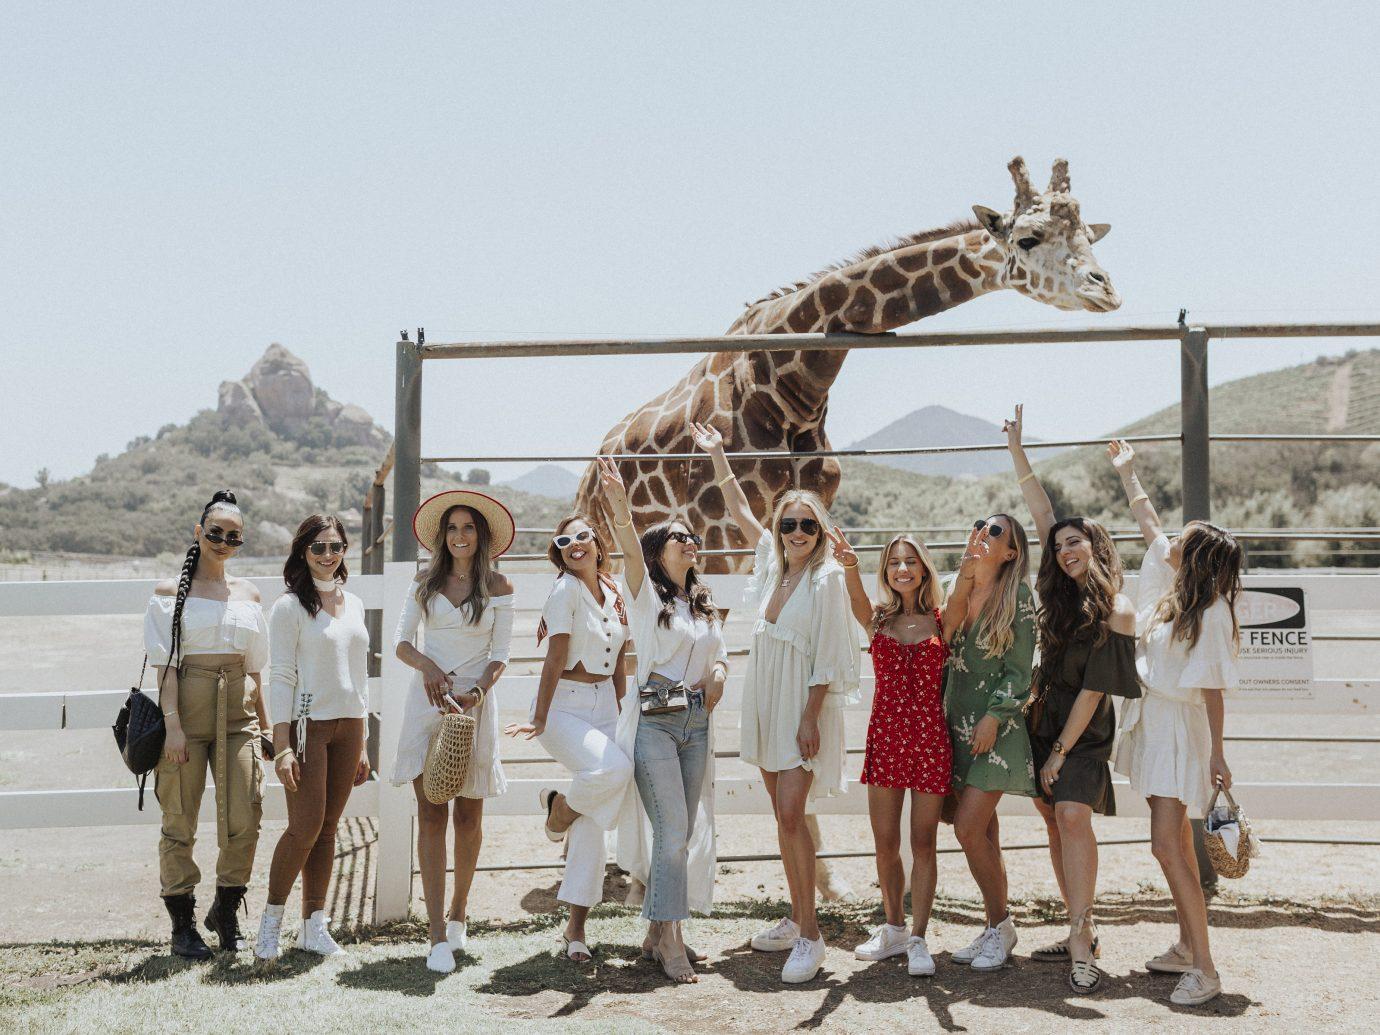 group of girls posing in front of giraffe